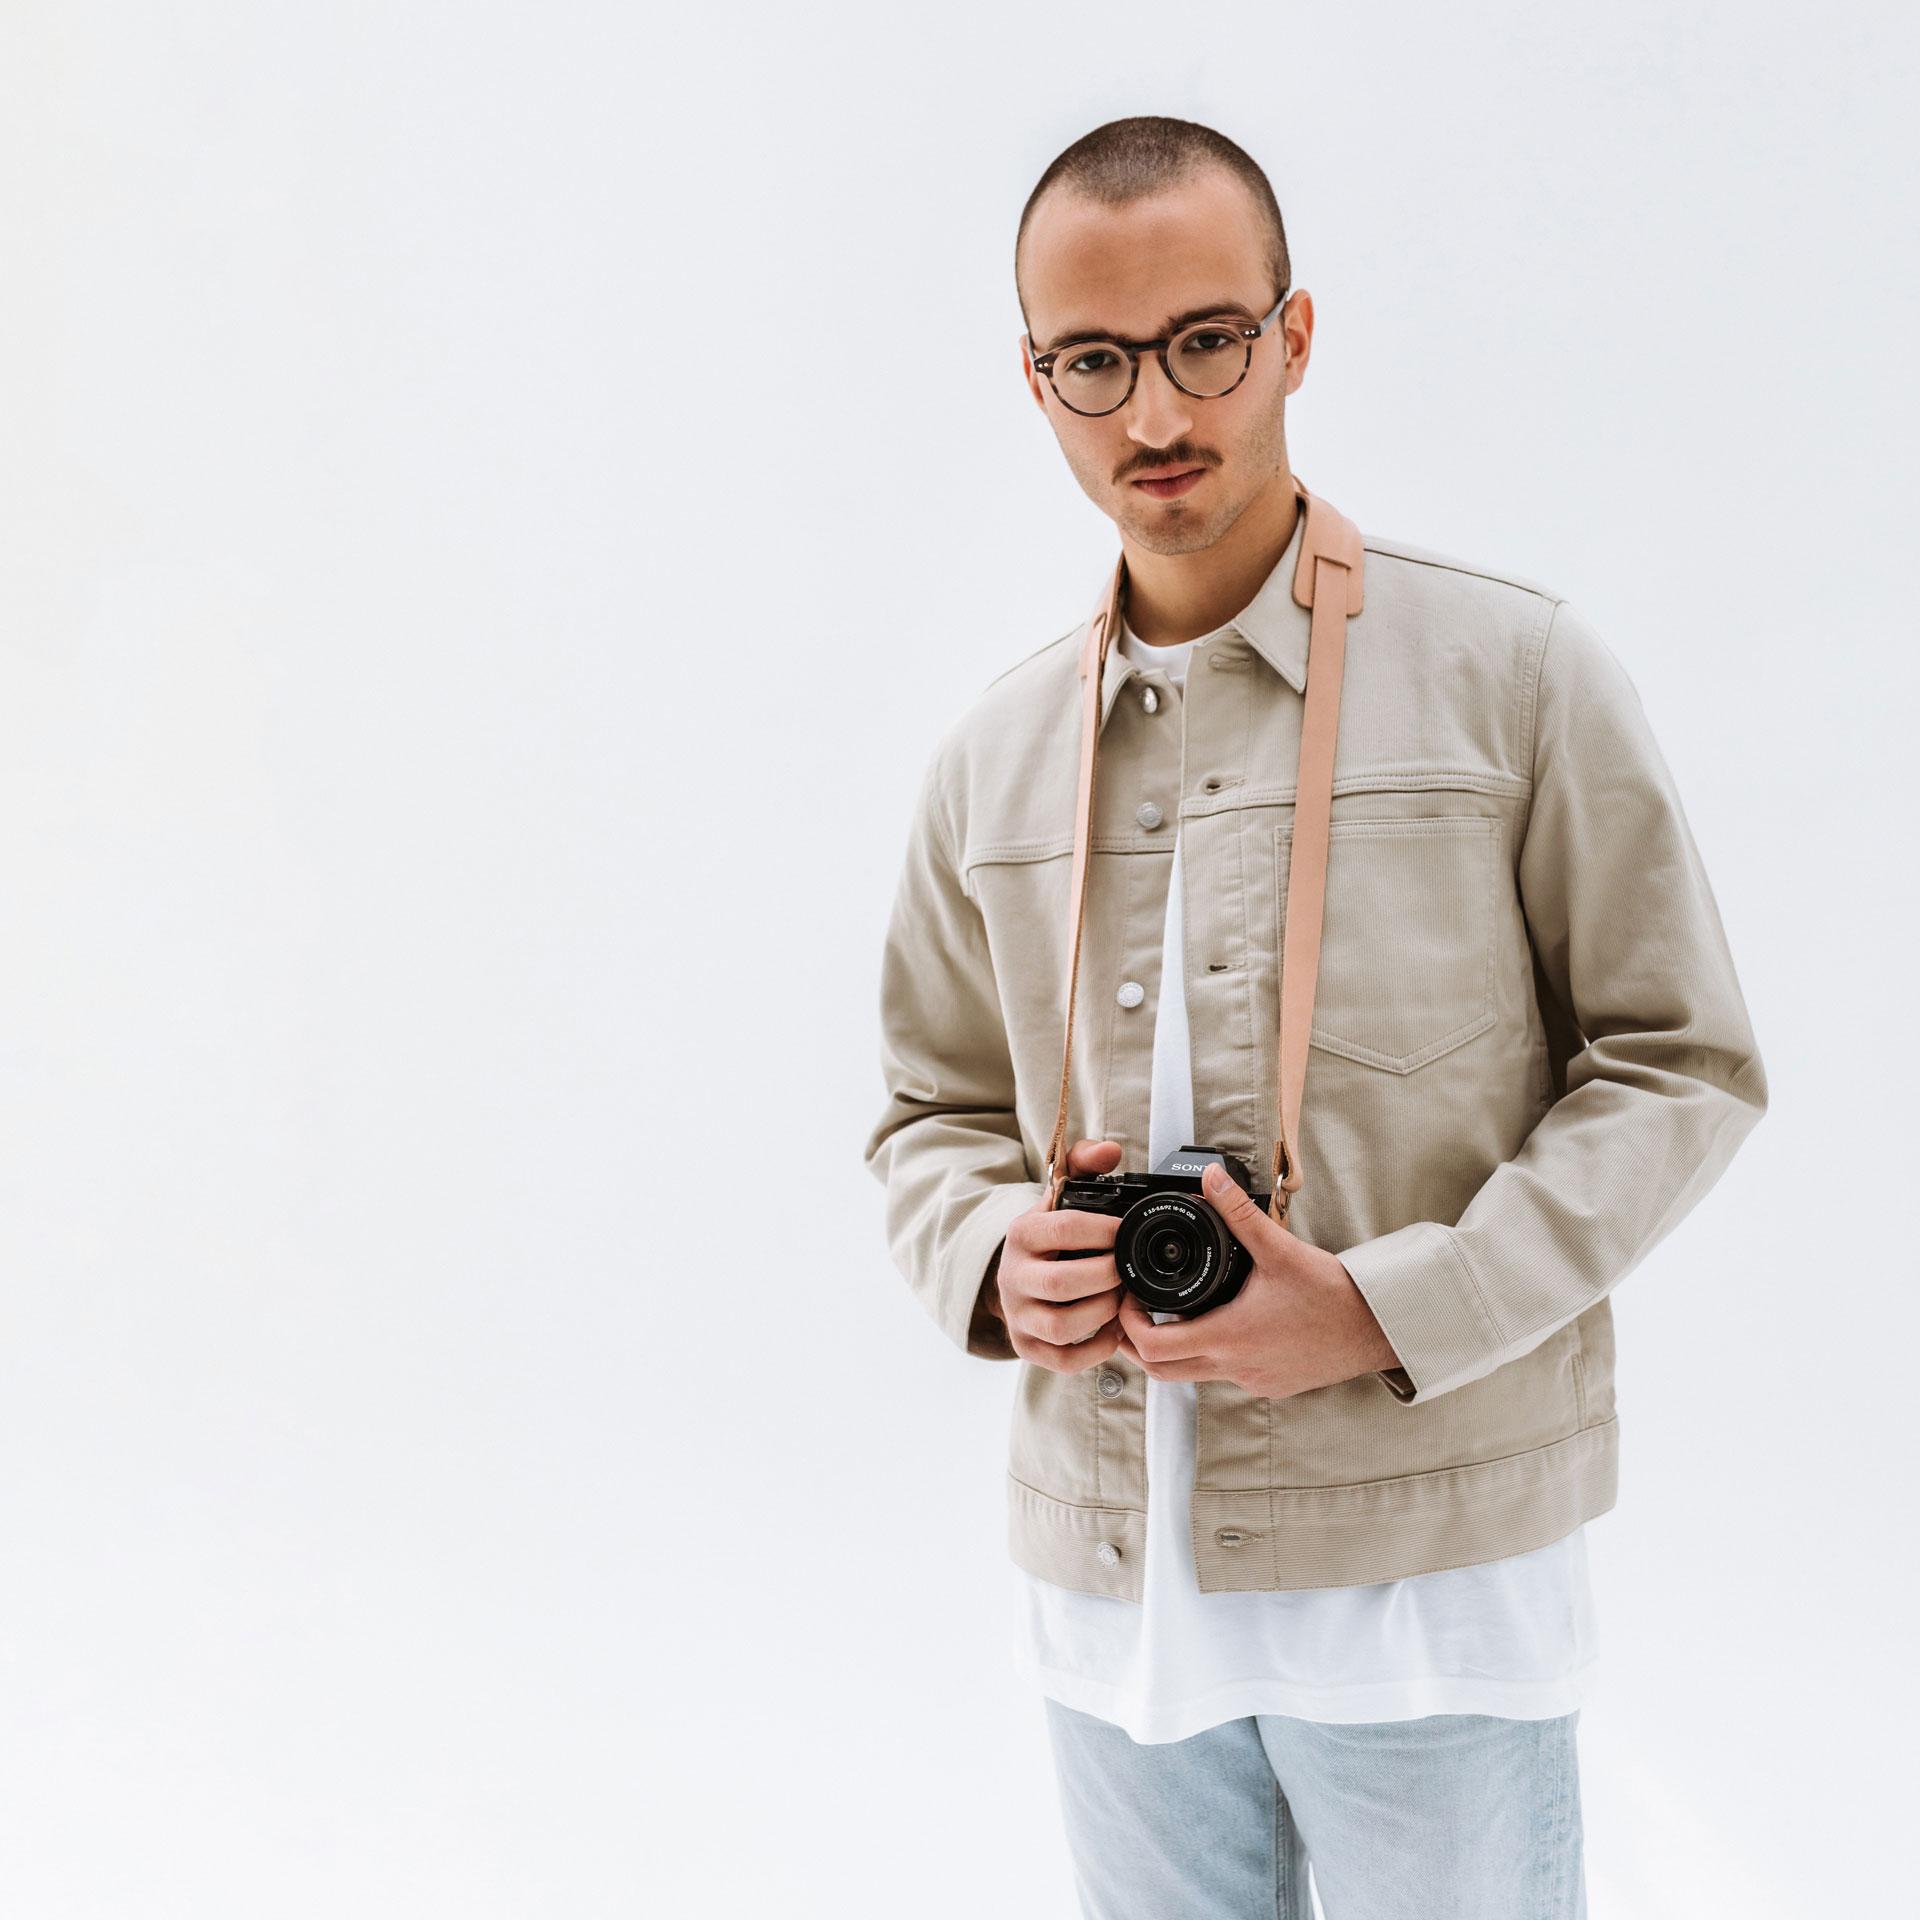 Unser Model trägt Fotogurt HAN um den Hals.